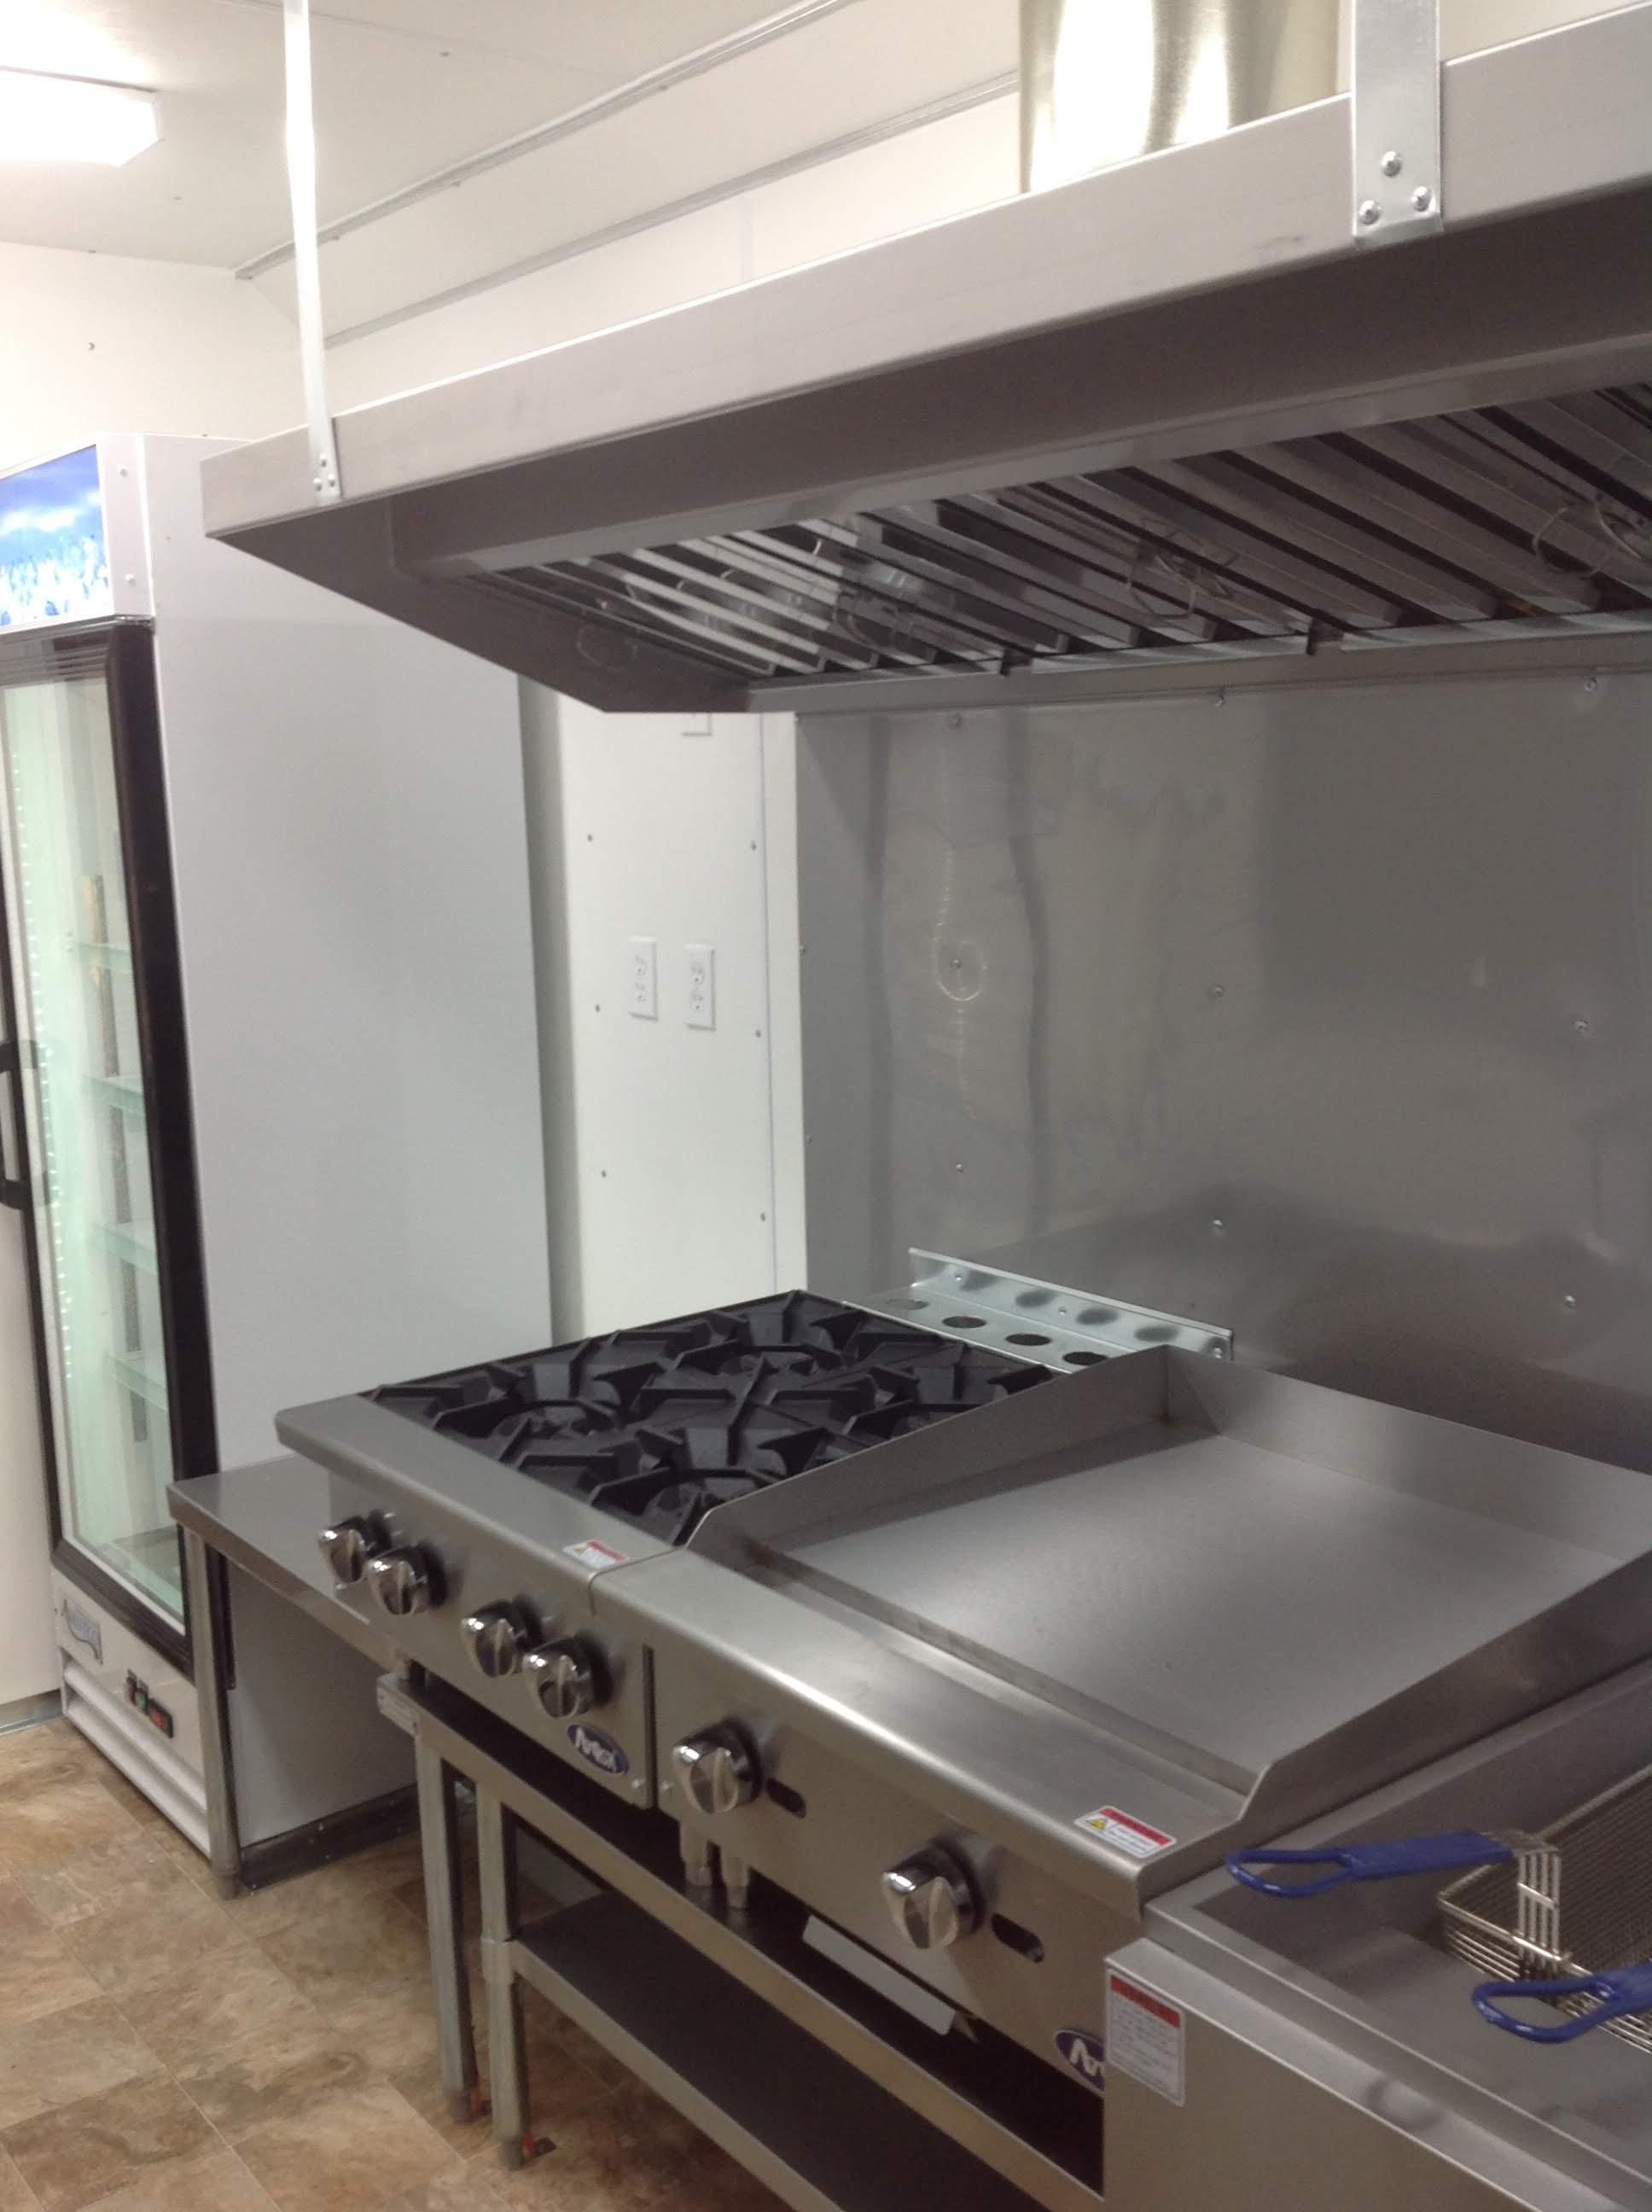 Trailer 10 Custom Kitchen Foodtruck 6